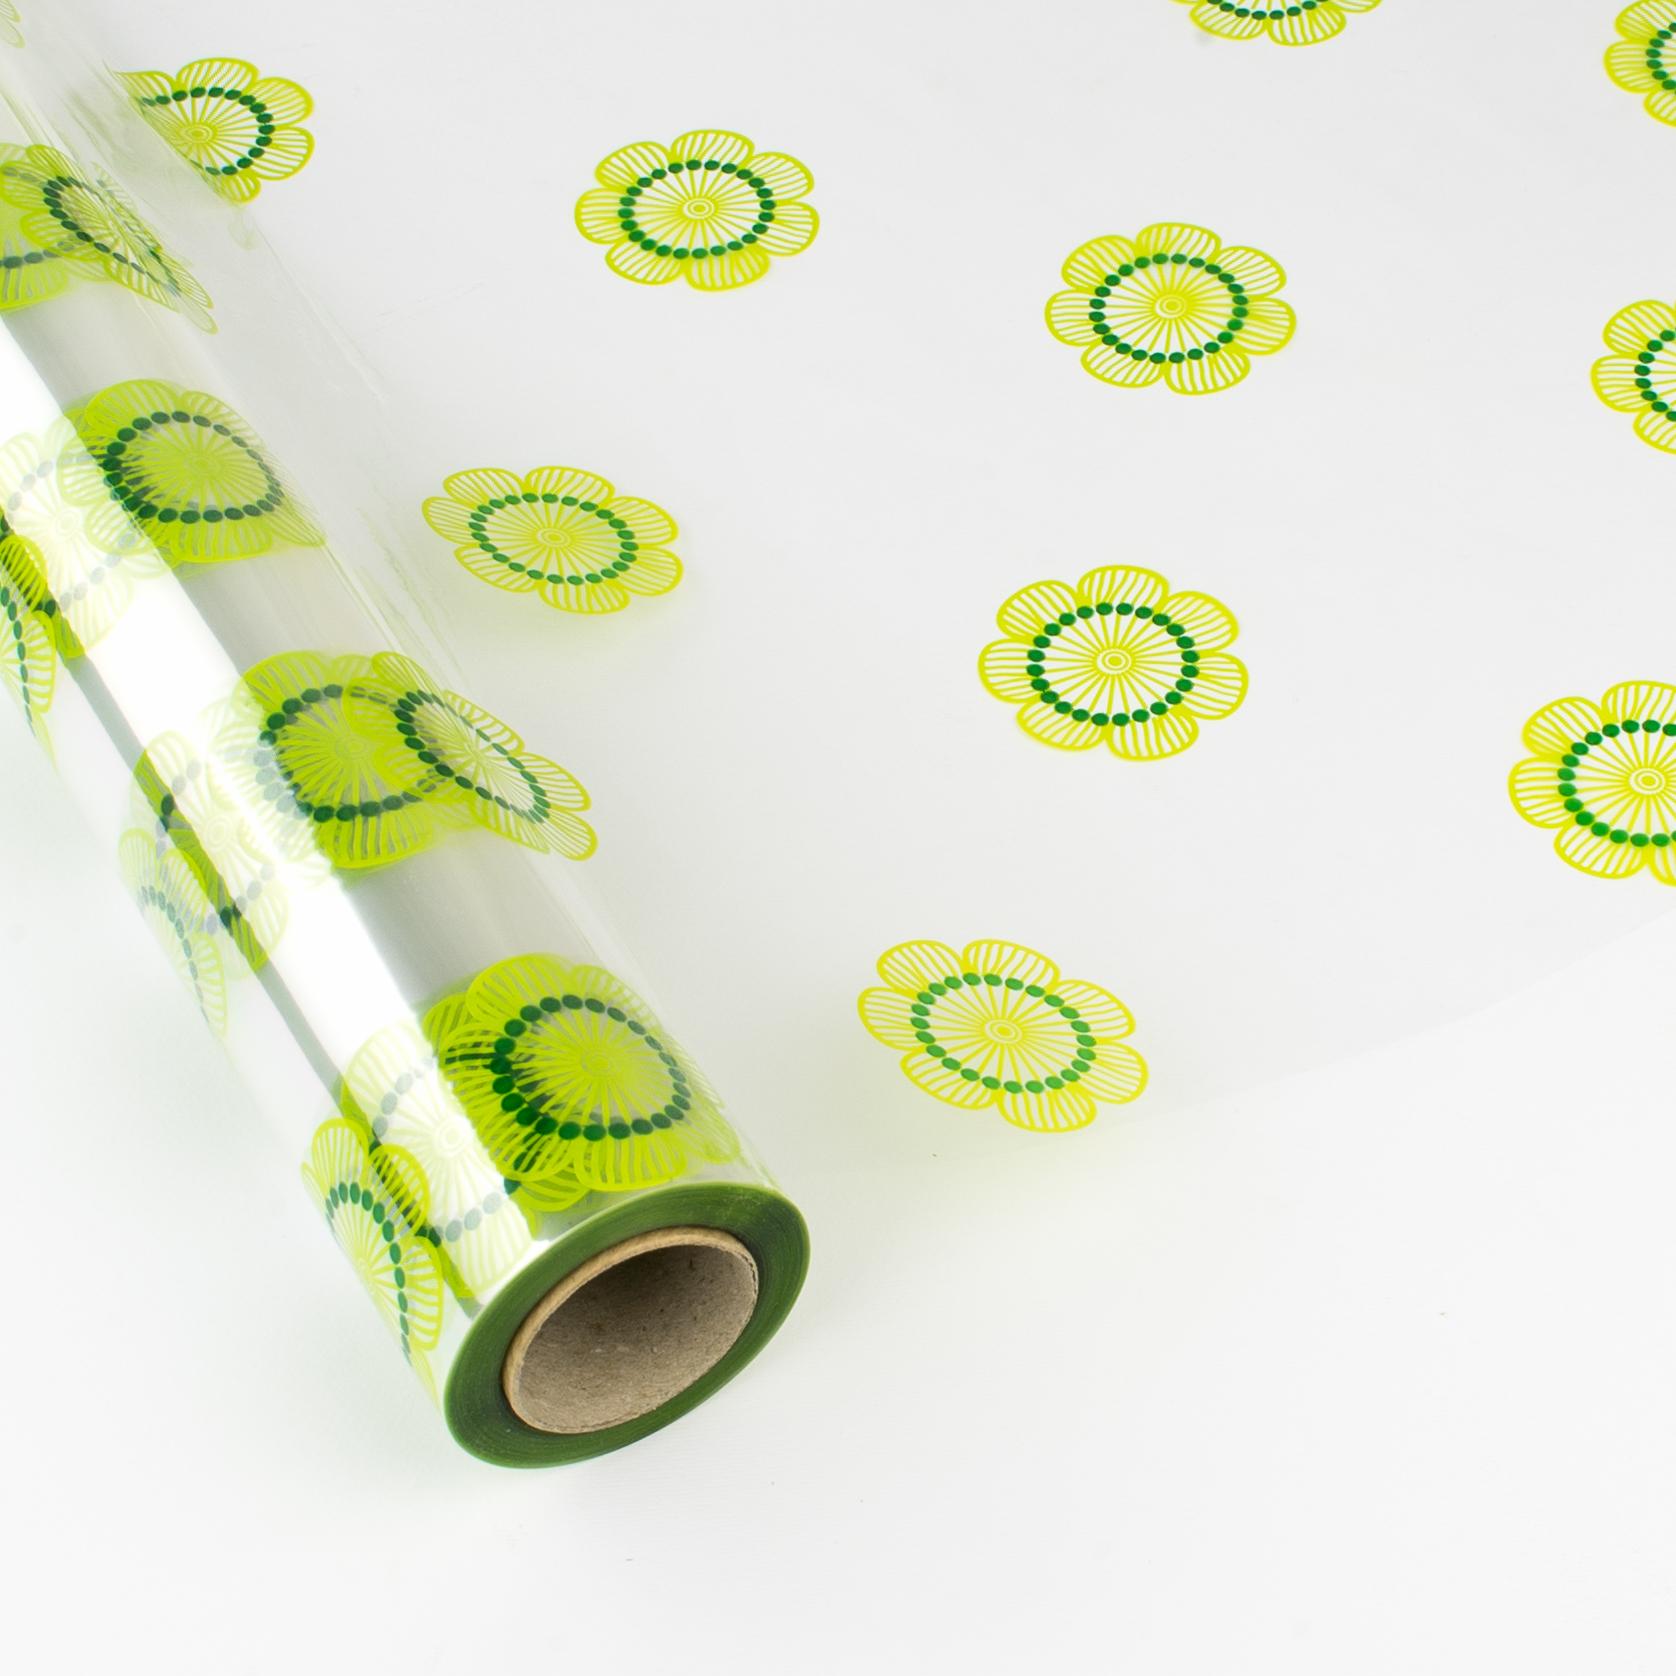 Papel de regalo transparente con flores amarillas y verdes - Papel de regalo transparente ...